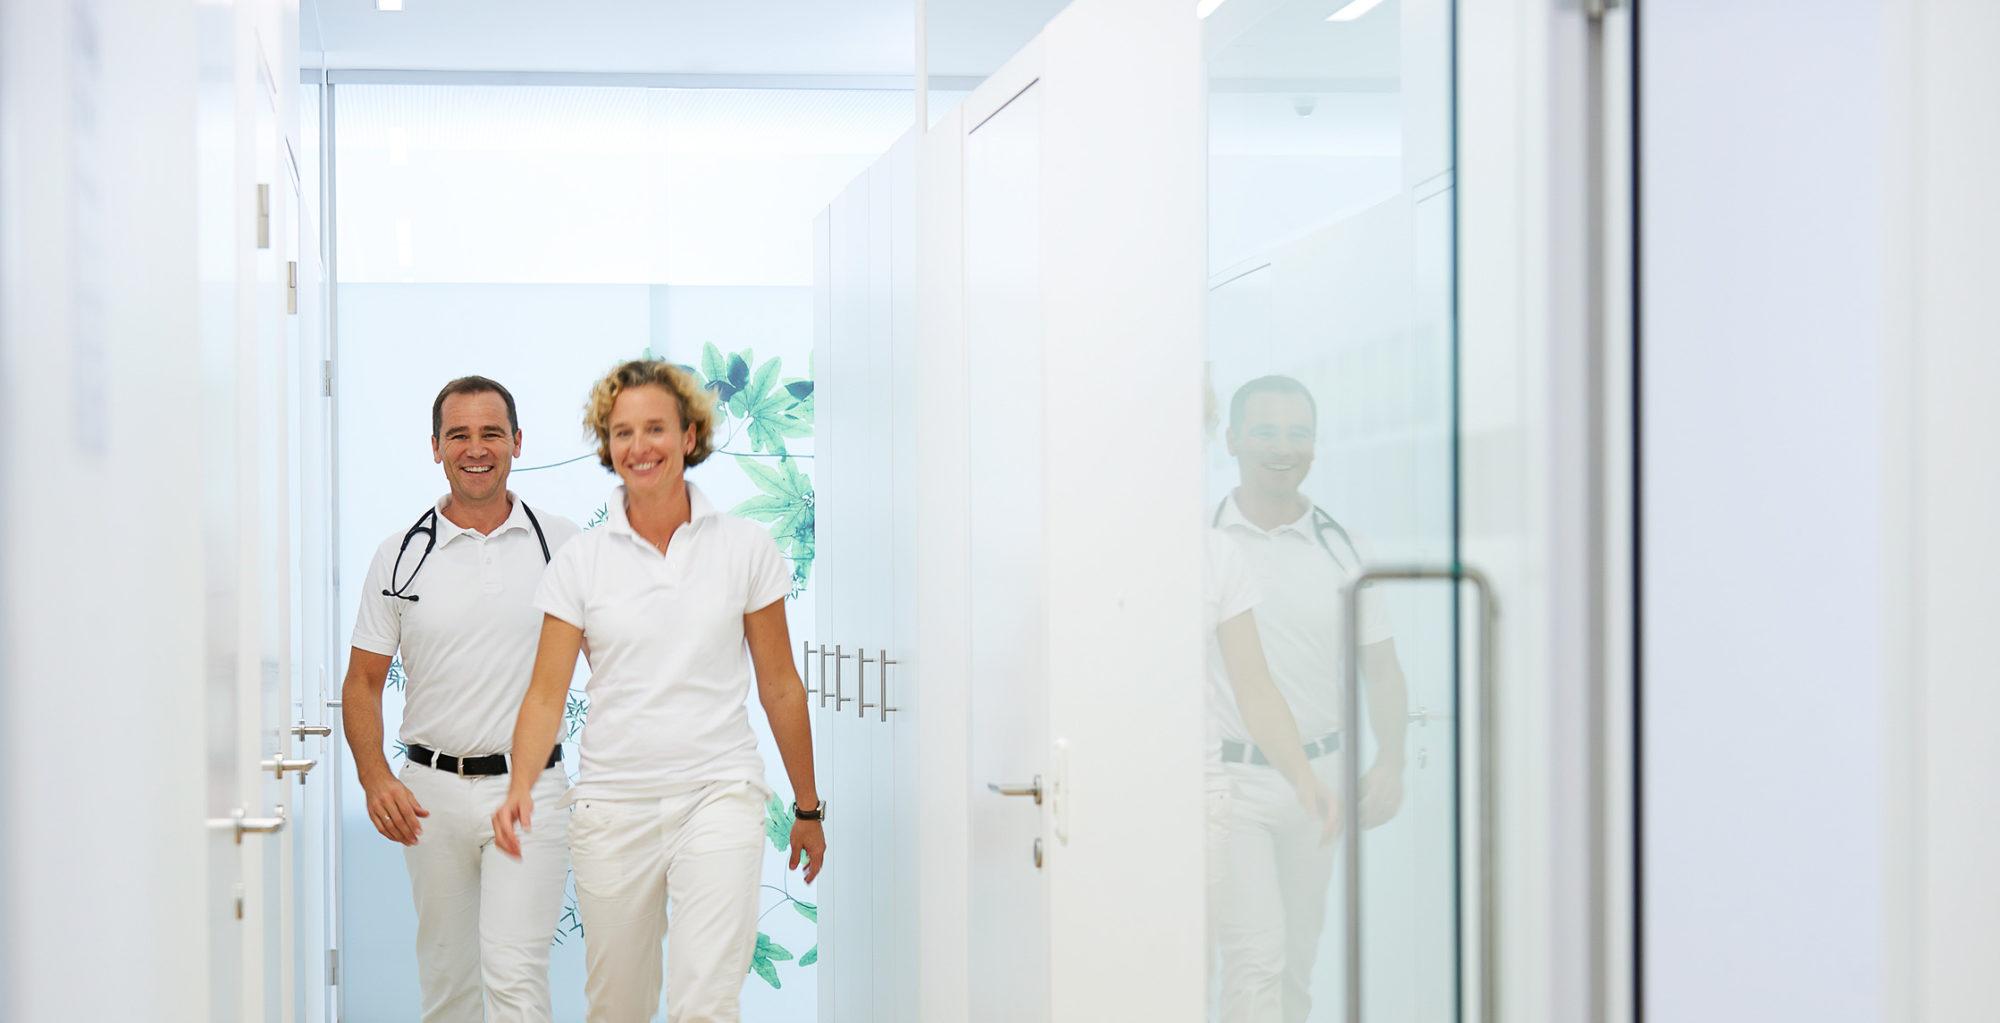 Dr. Alexandra und Dr. Andreas Werle